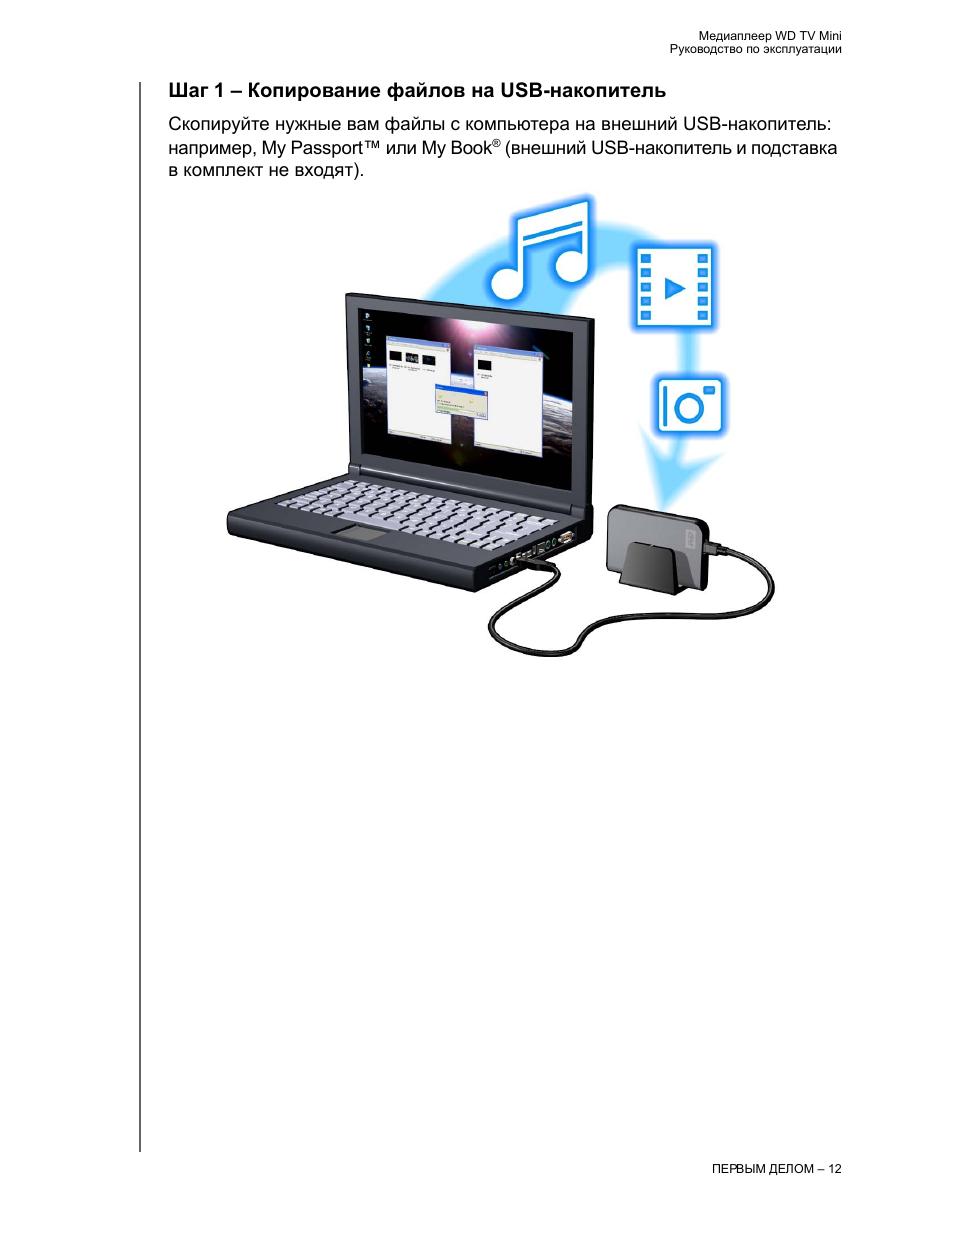 1 usb rh manualsdir ru wd tv mini media player manual español wd tv mini media player specifications